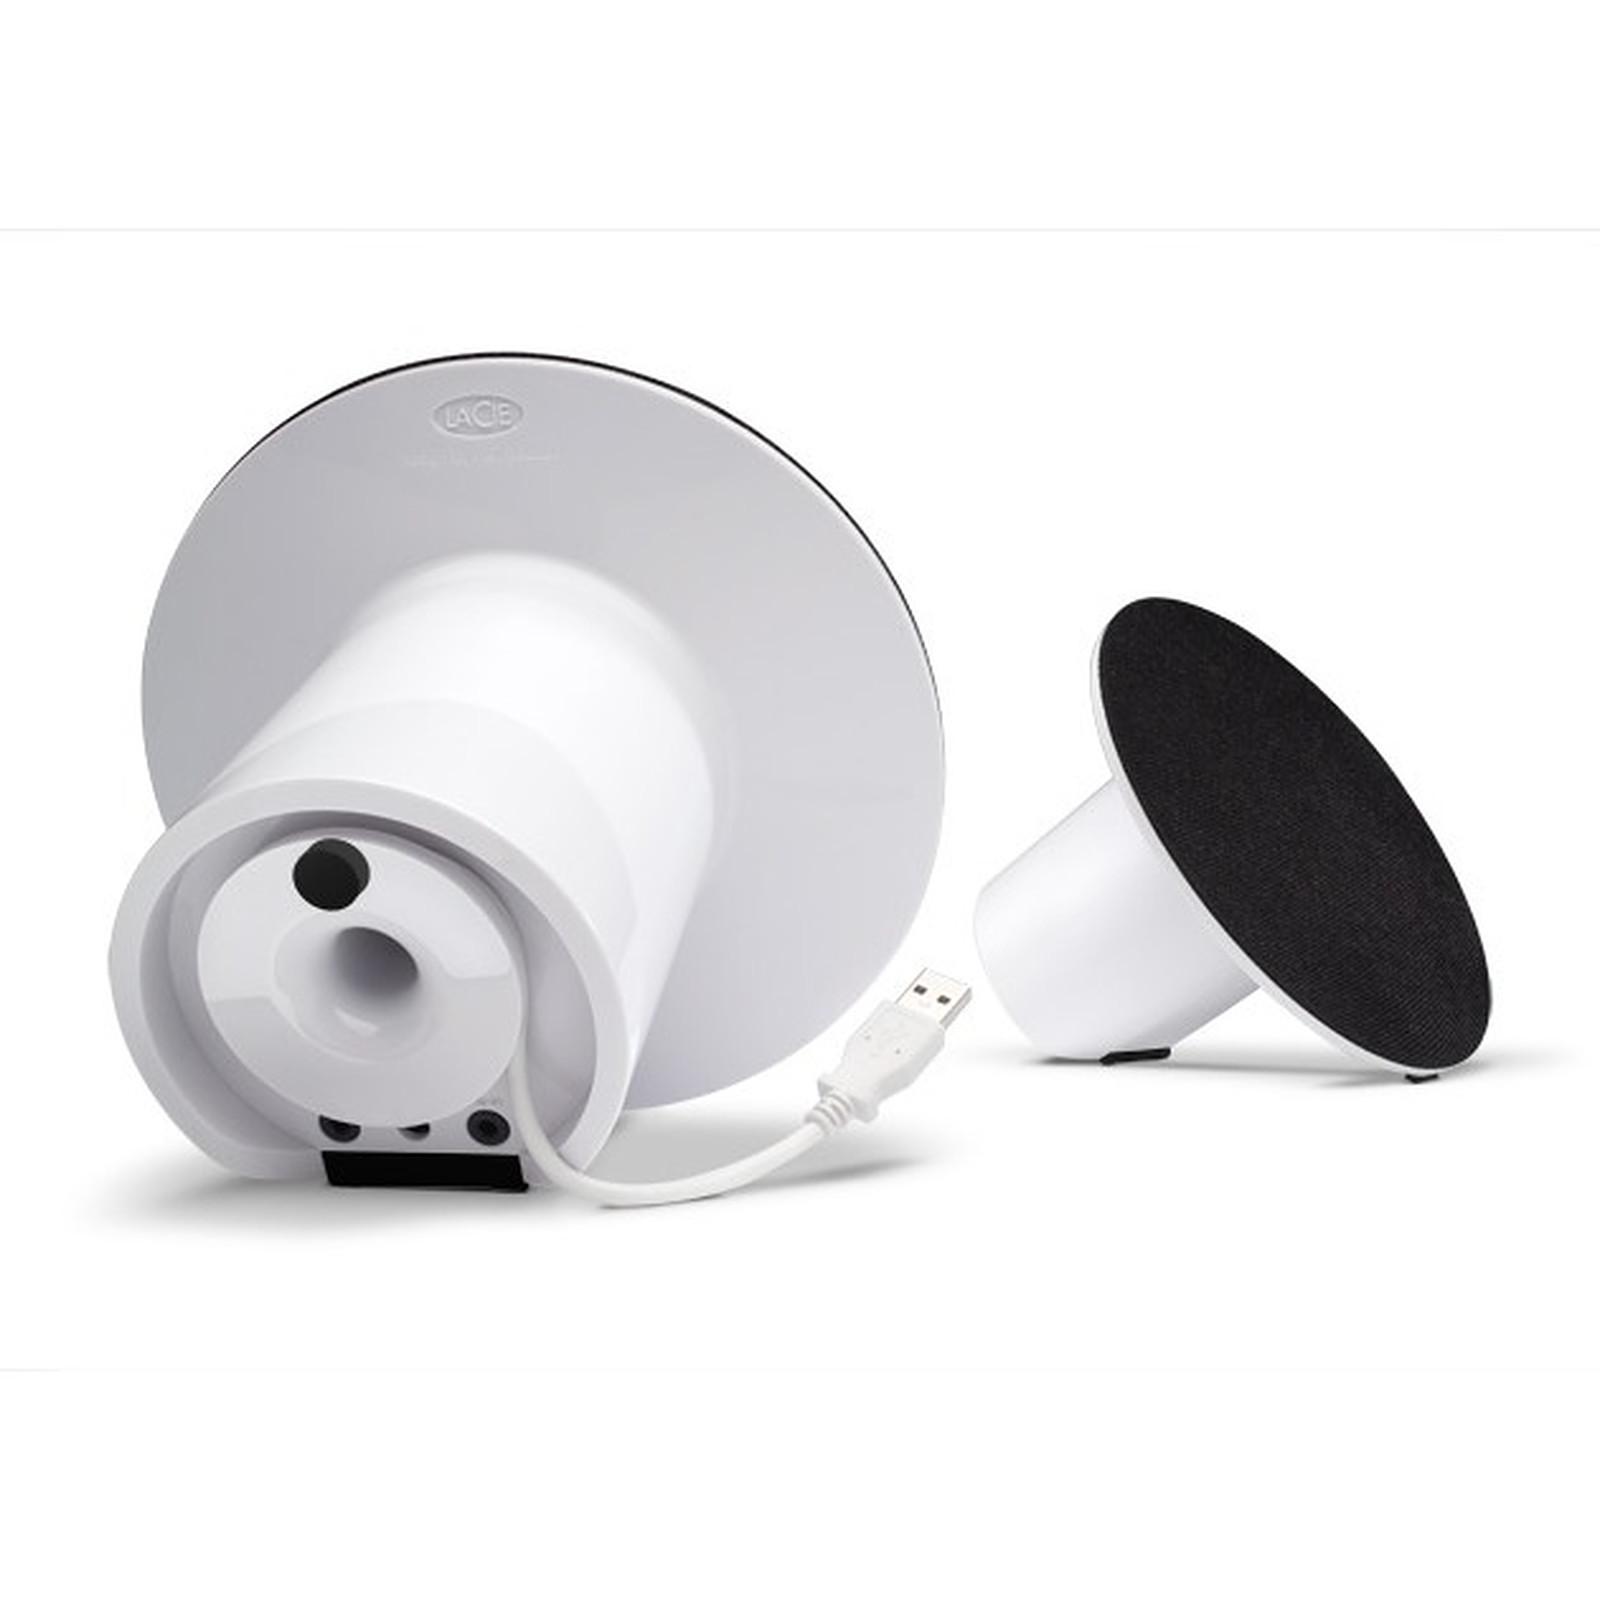 LaCie Sound² Speakers